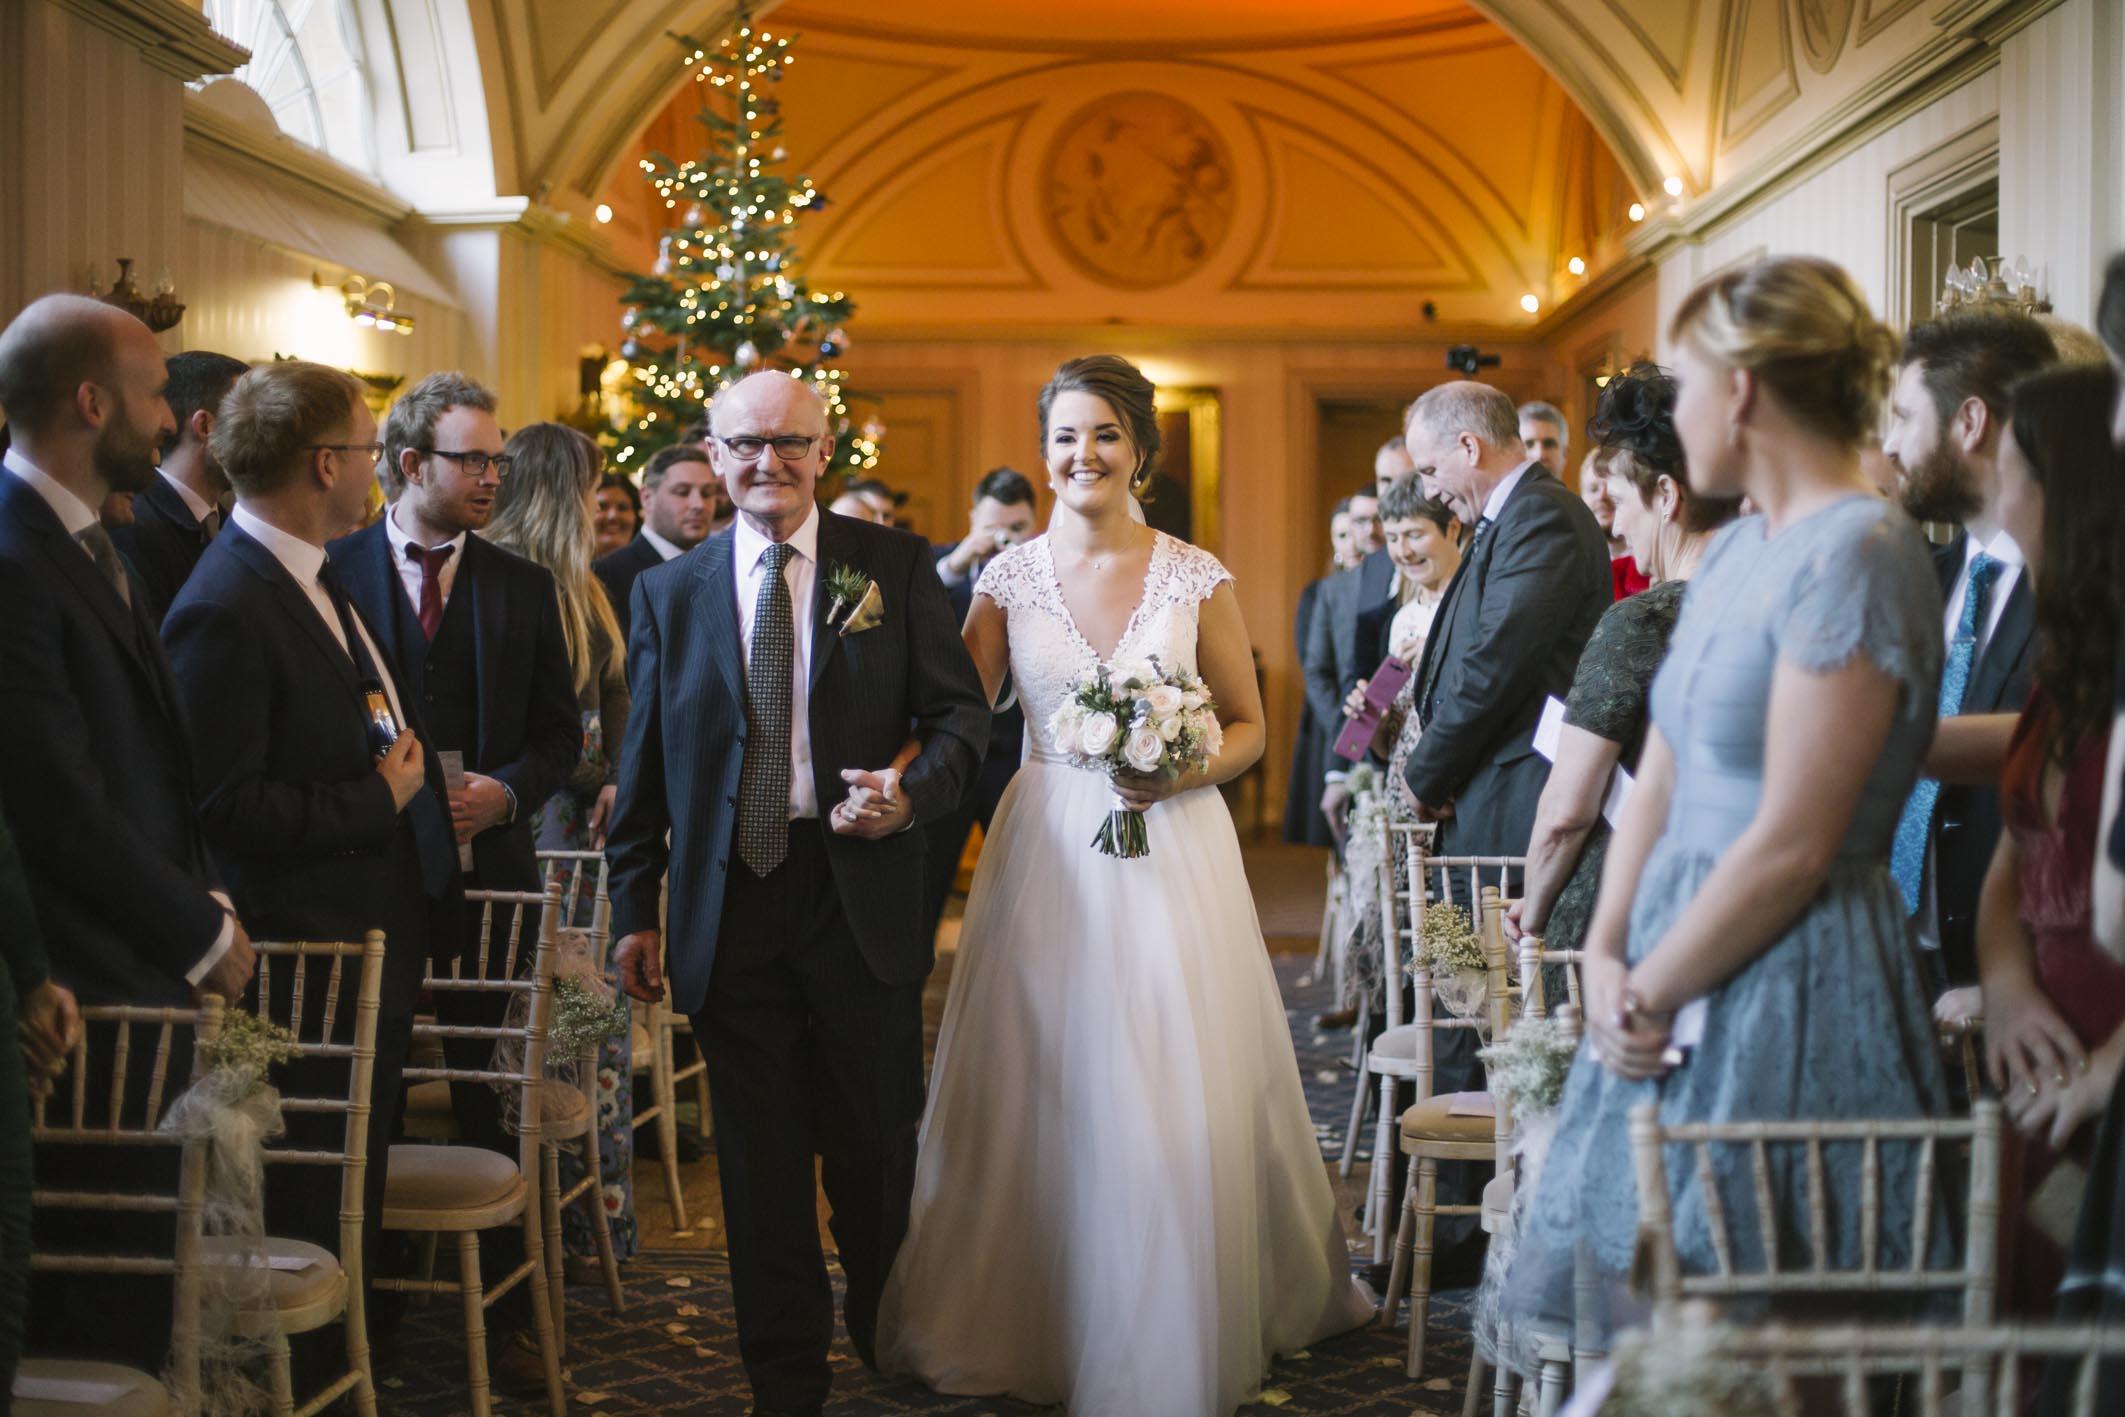 Bride walking down the aisle at Elegant Winter Balbirnie House Wedding by Ceranna Photography